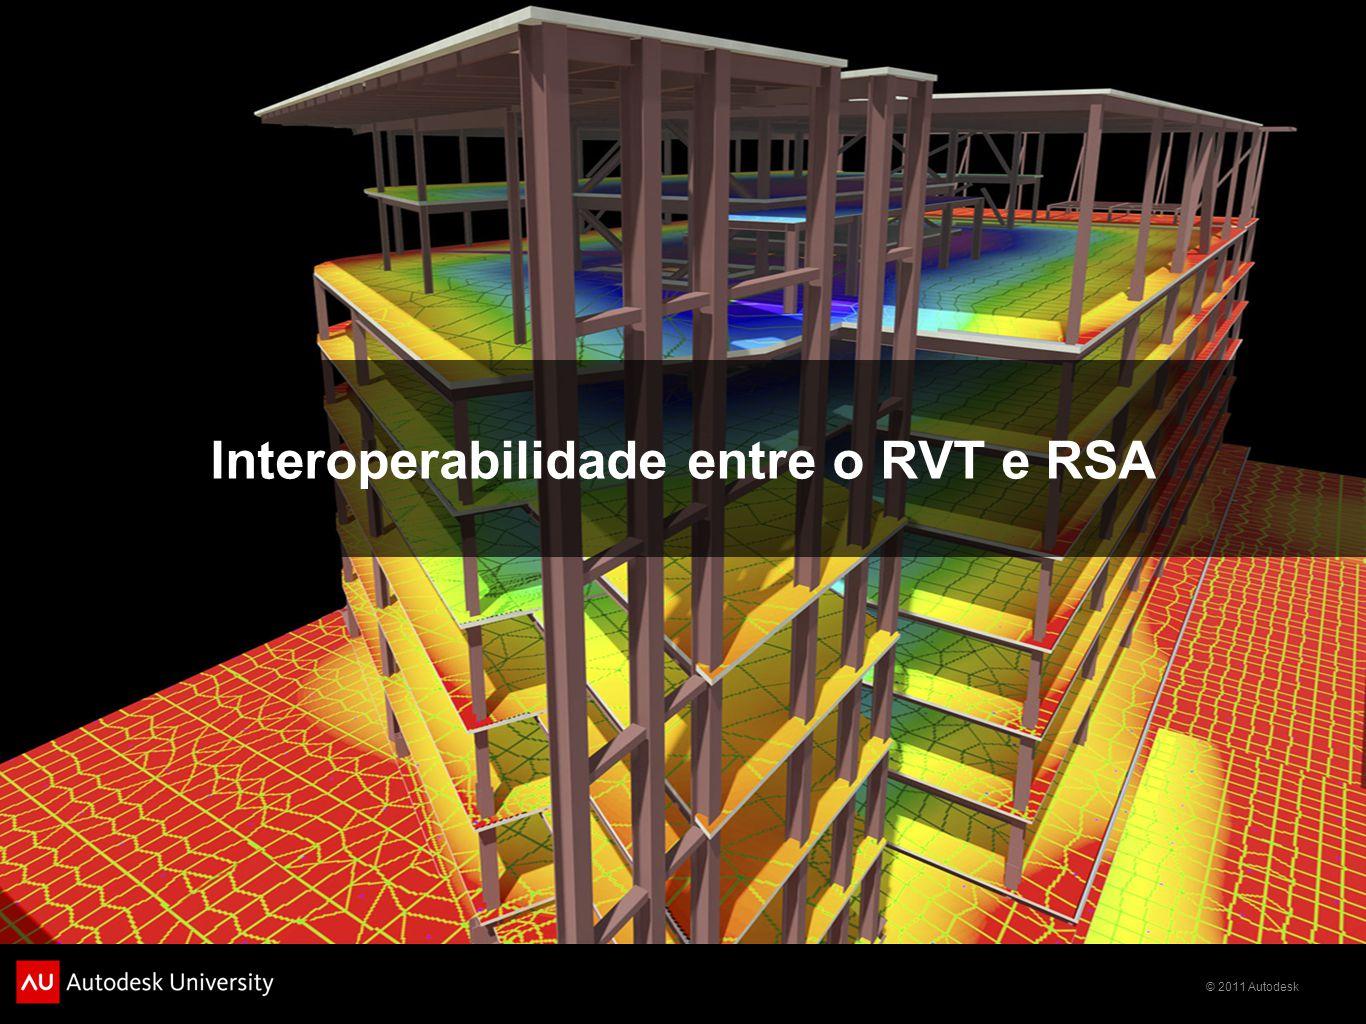 Interoperabilidade entre o RVT e RSA